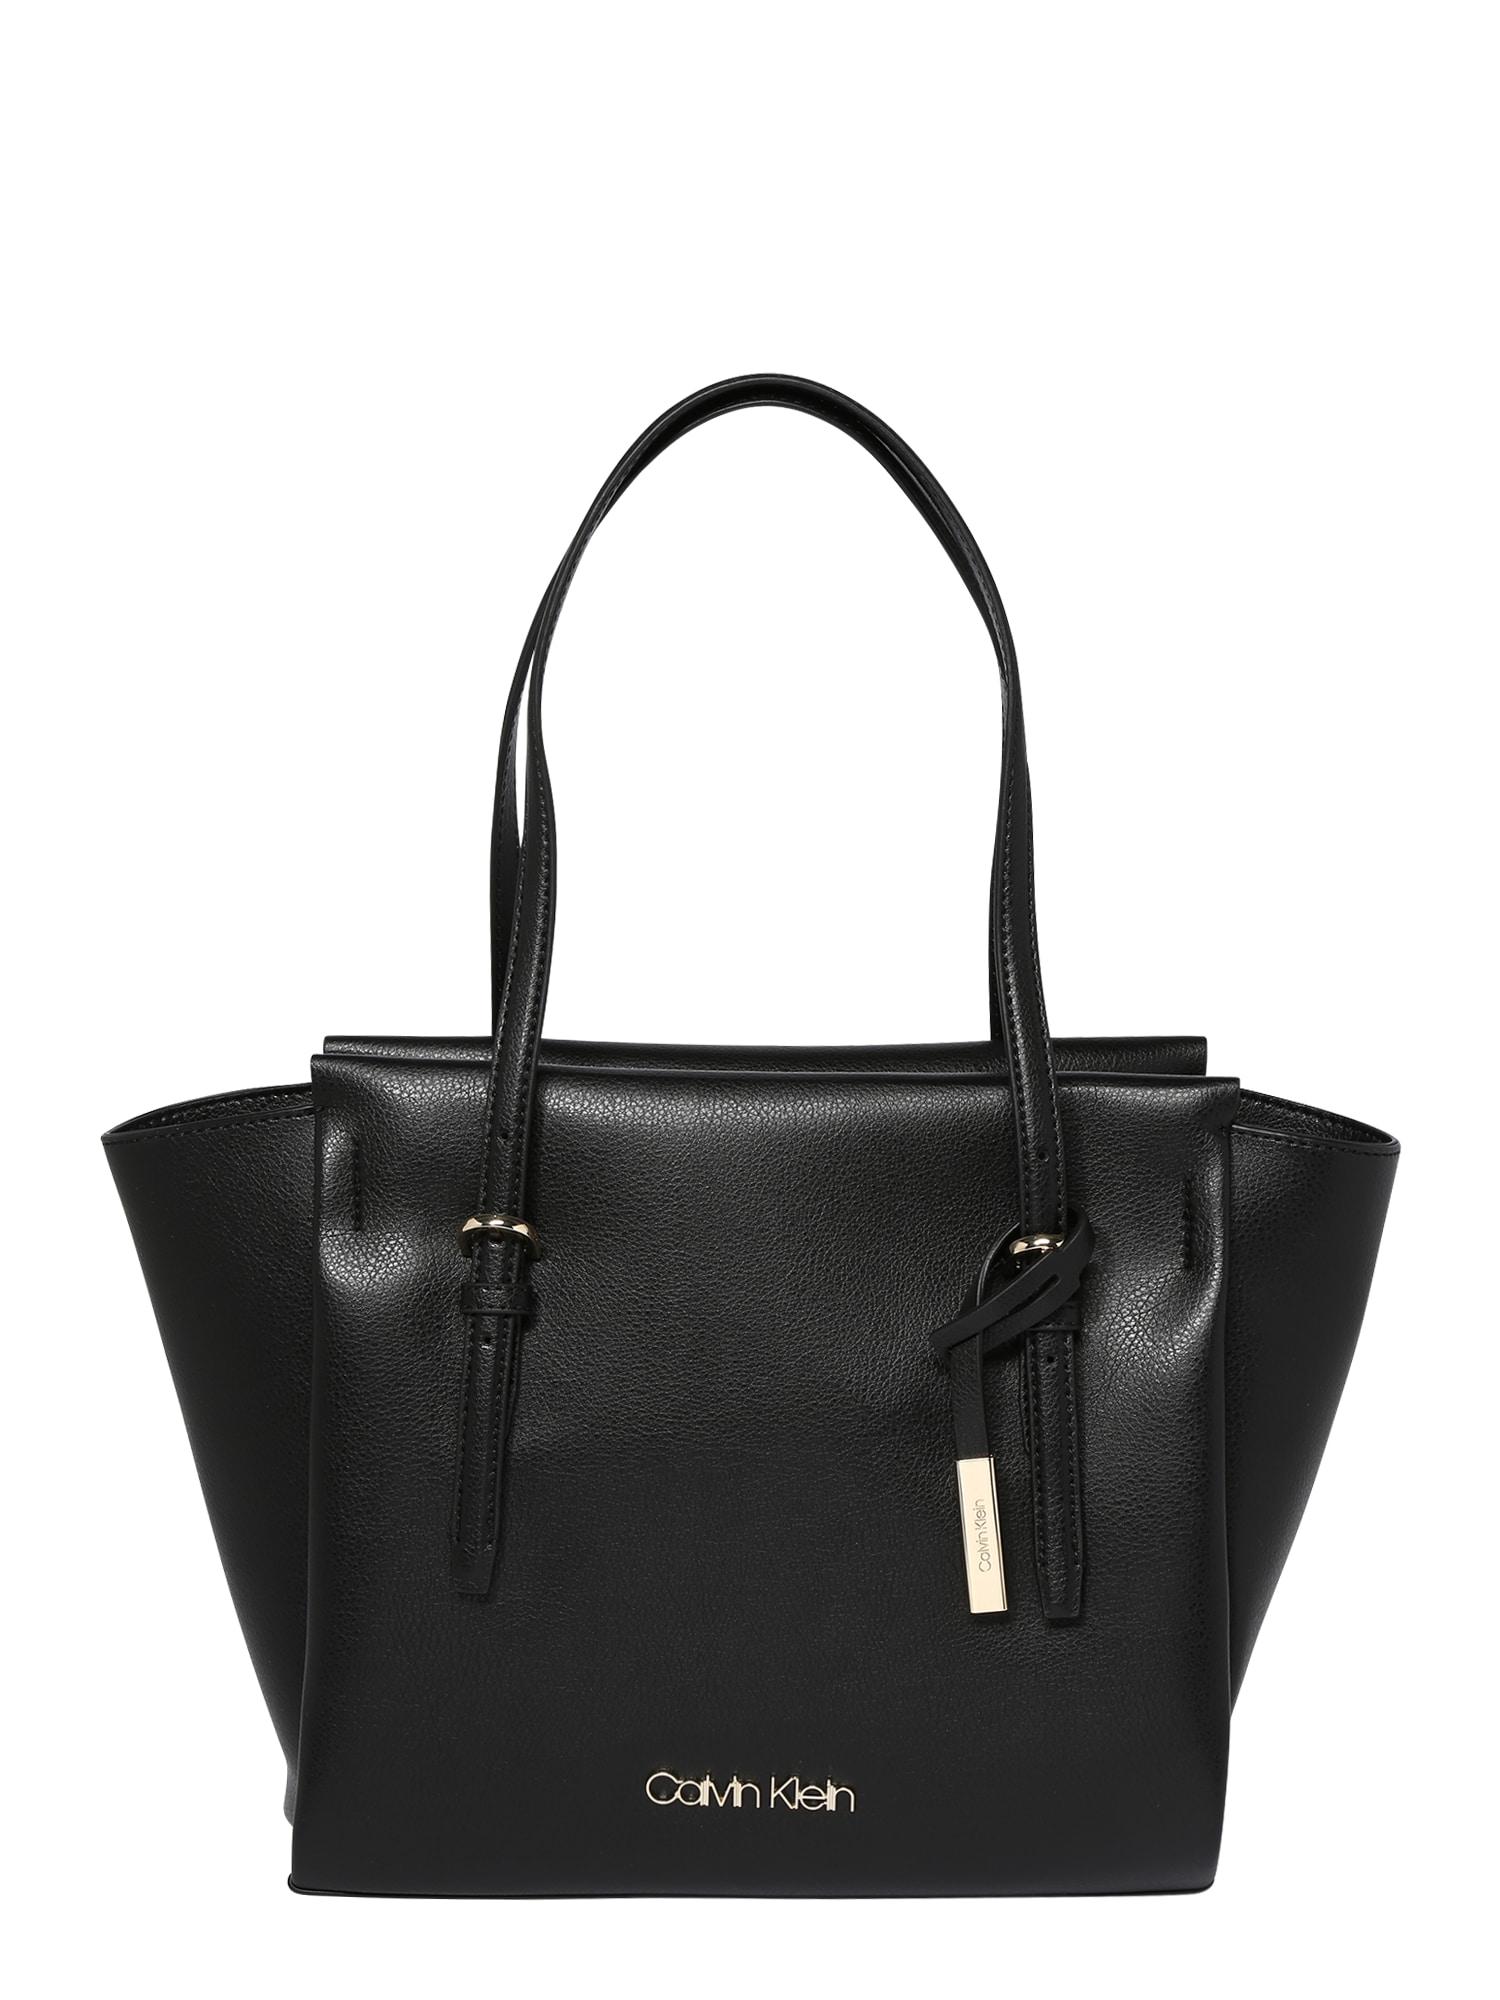 Nákupní taška Avant černá Calvin Klein